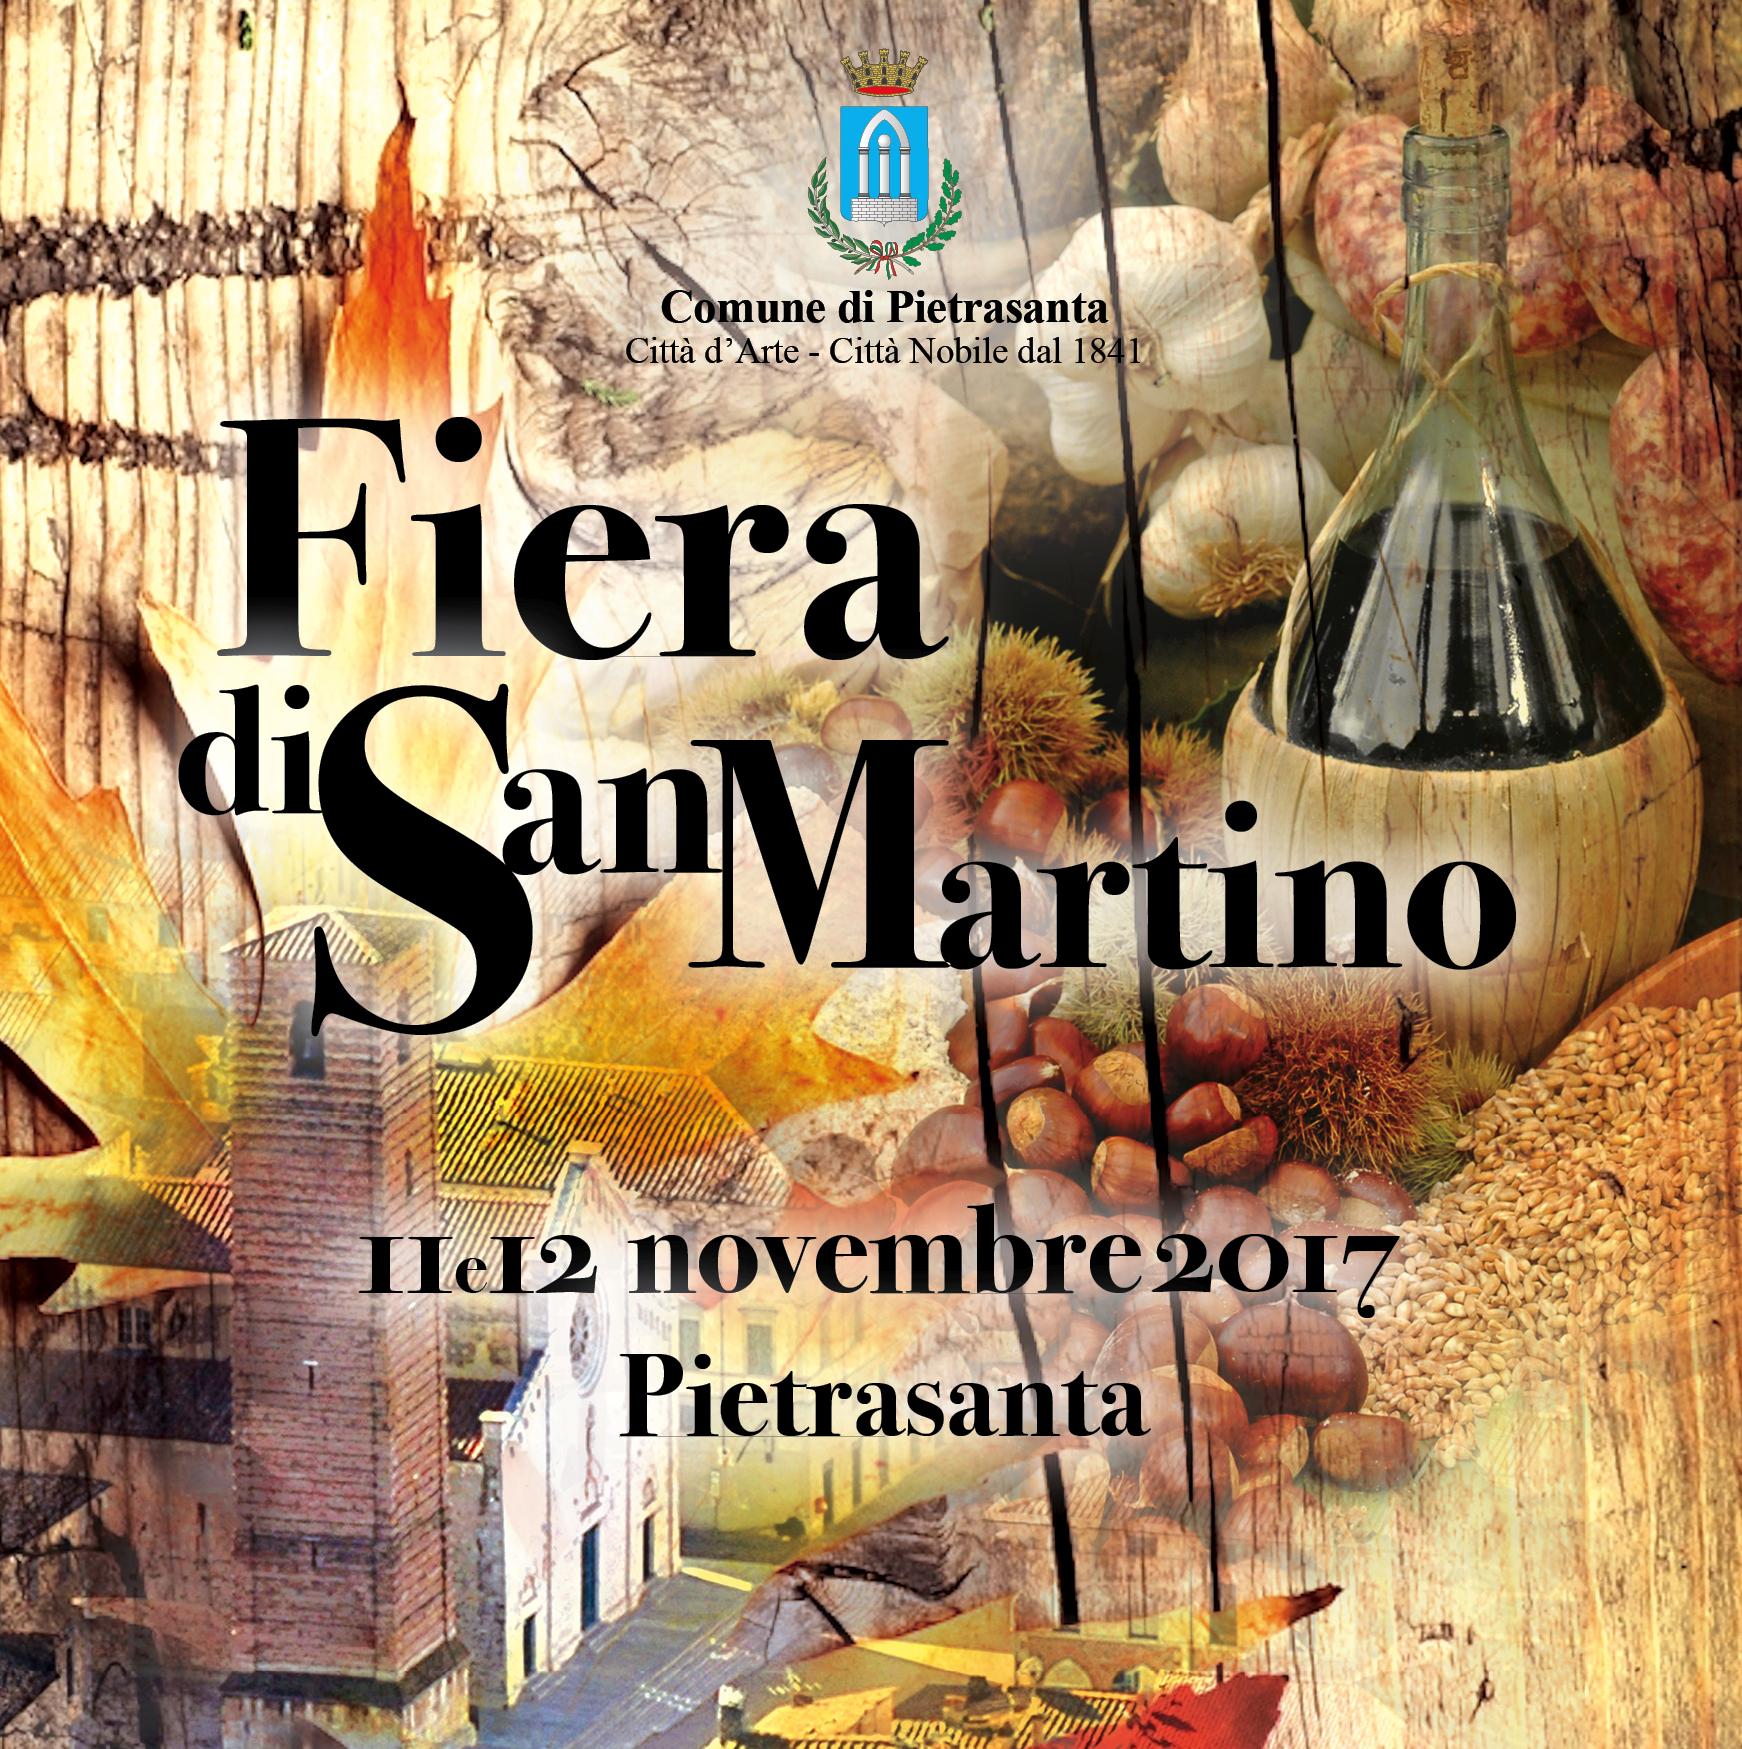 Fiera di San Martino, i provvedimenti di viabilità